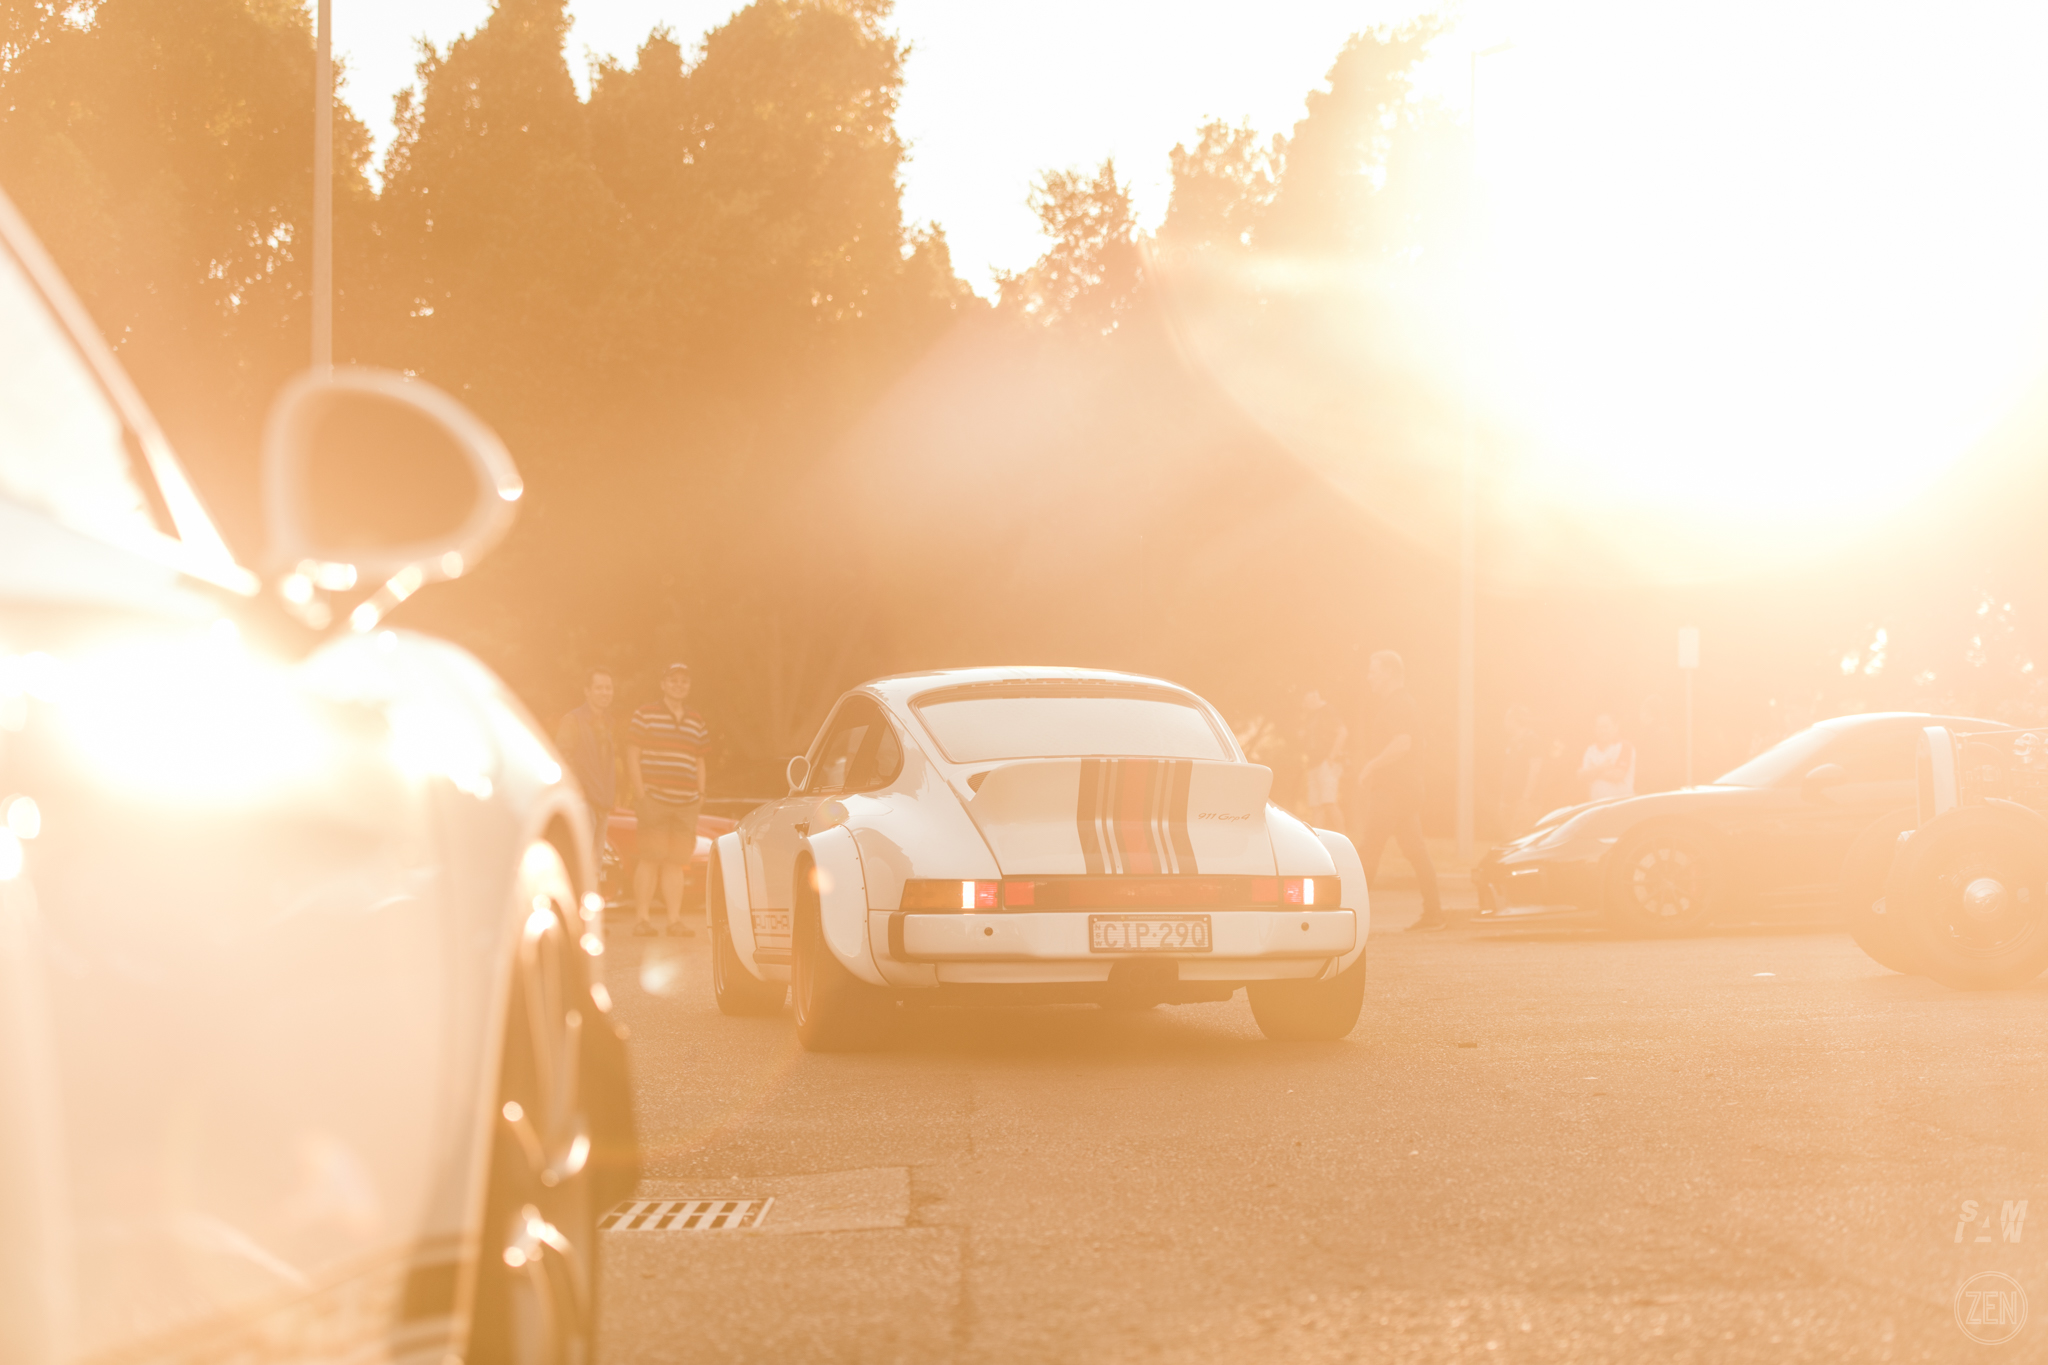 2019-10-27 - Autohaus Porsches & Coffee 034